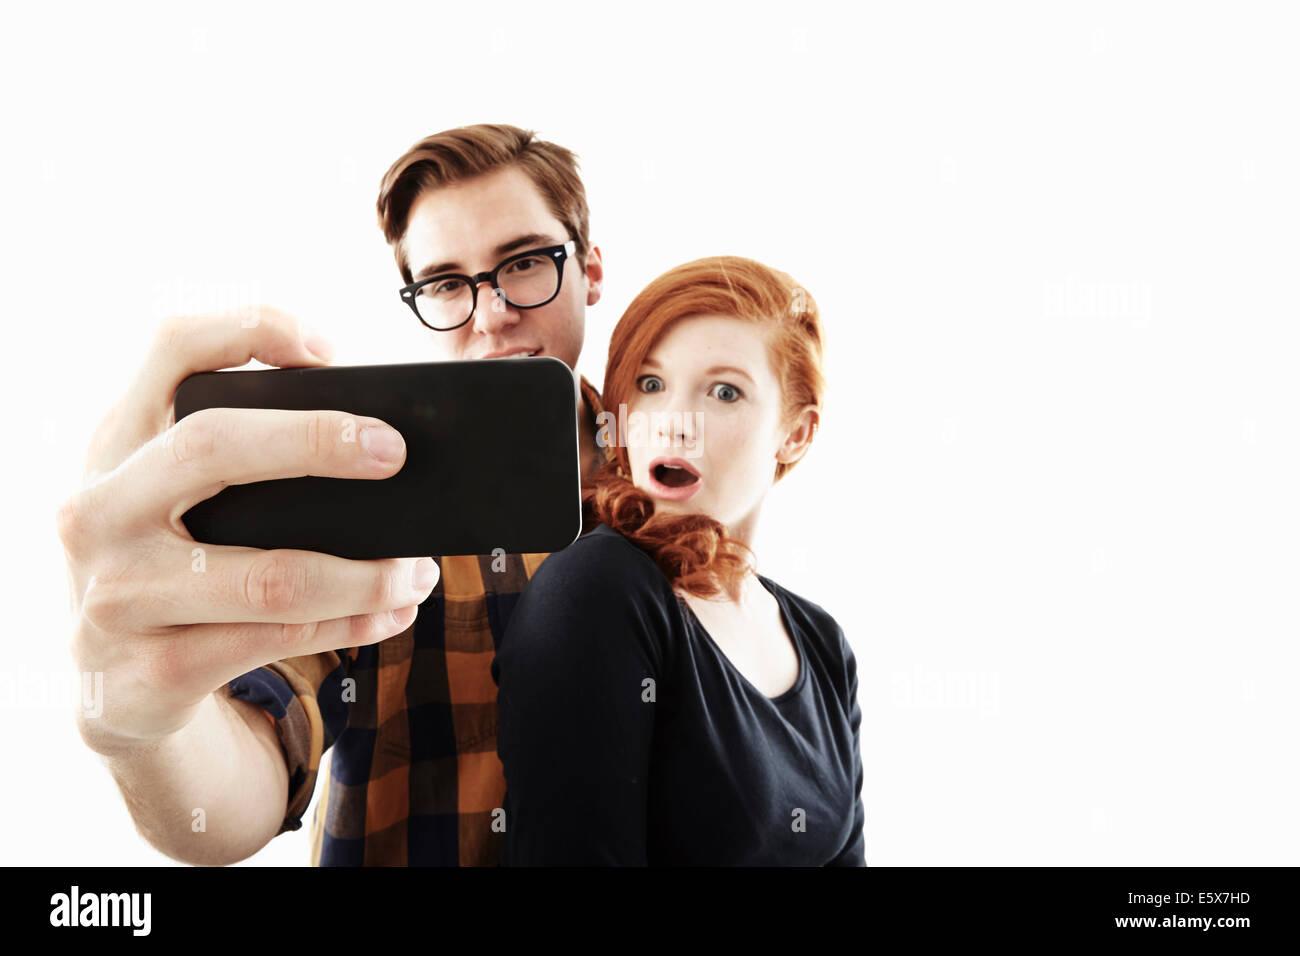 Studio shot of young couple posing for selfie on smartphone - Stock Image